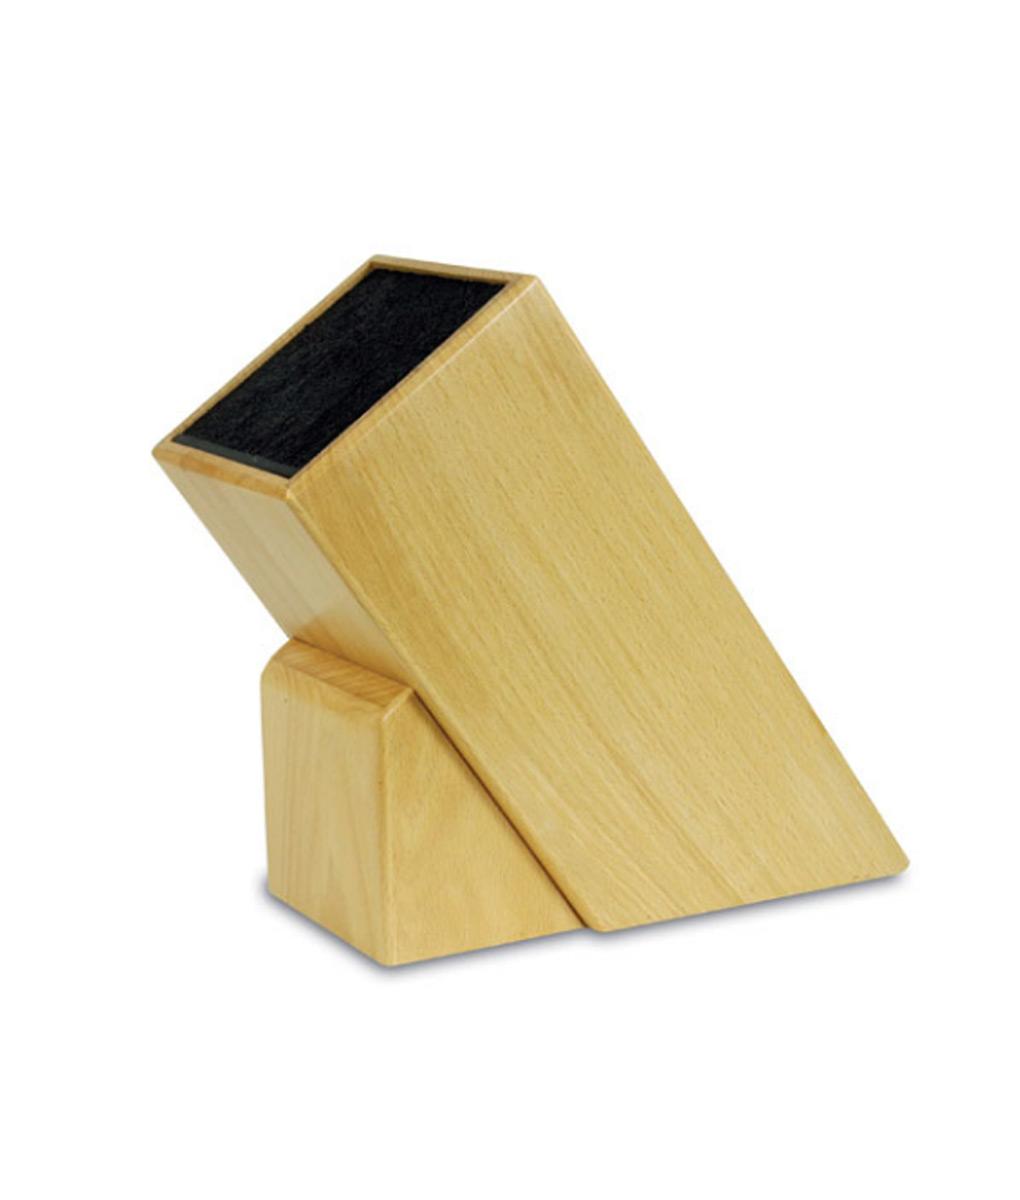 iBlock Knife Block Cases & Storage